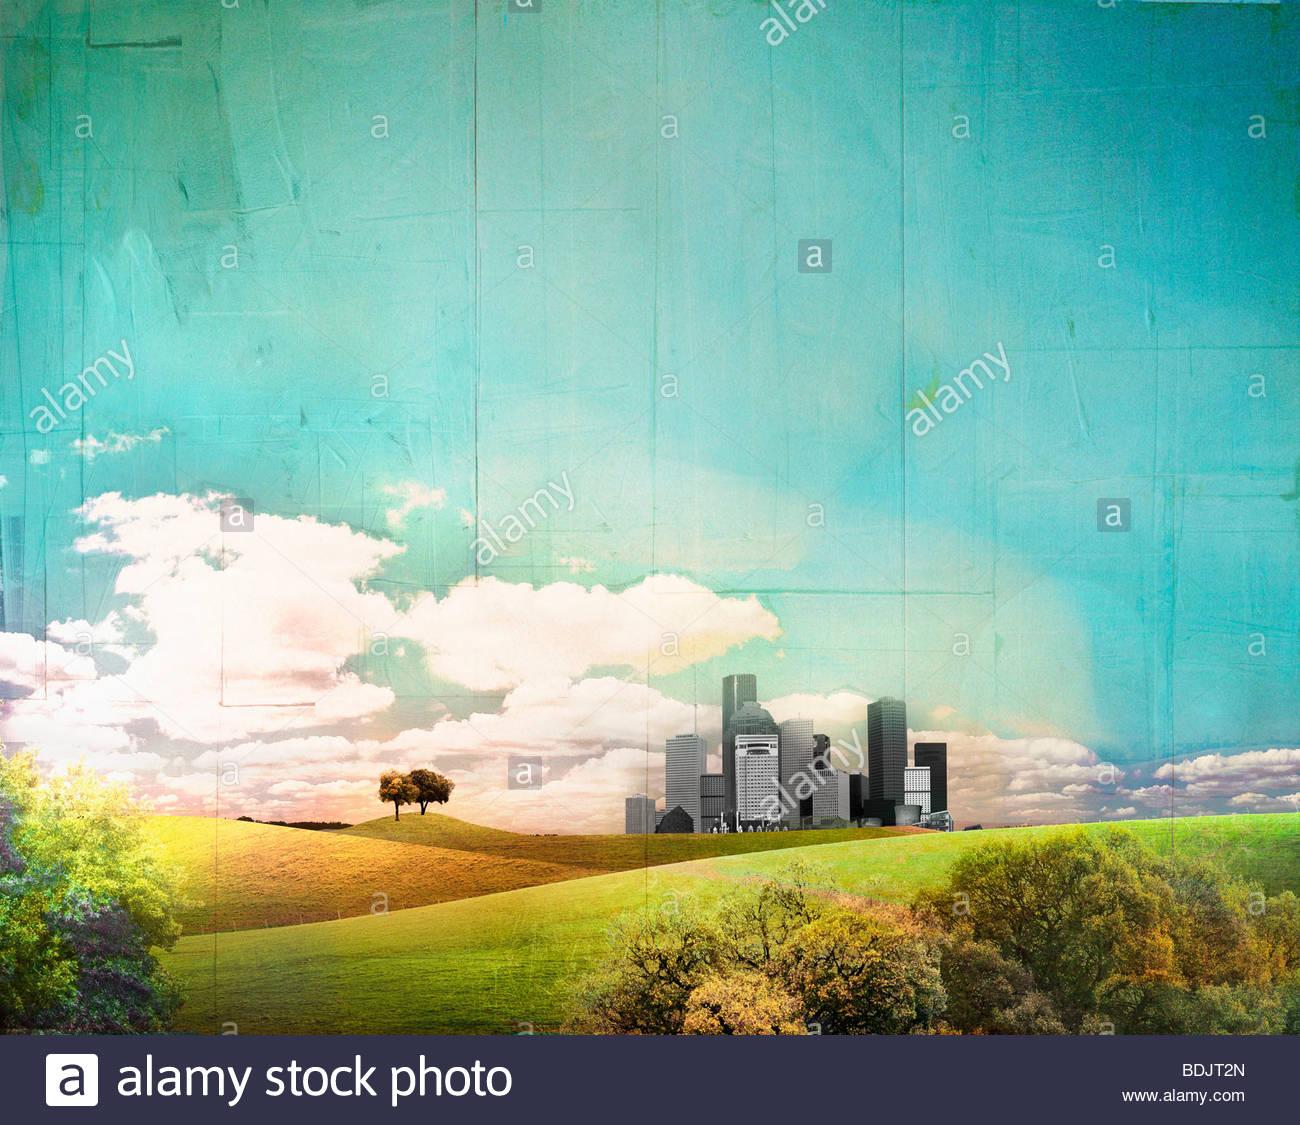 Paysage urbain paysage lointain derrière Photo Stock